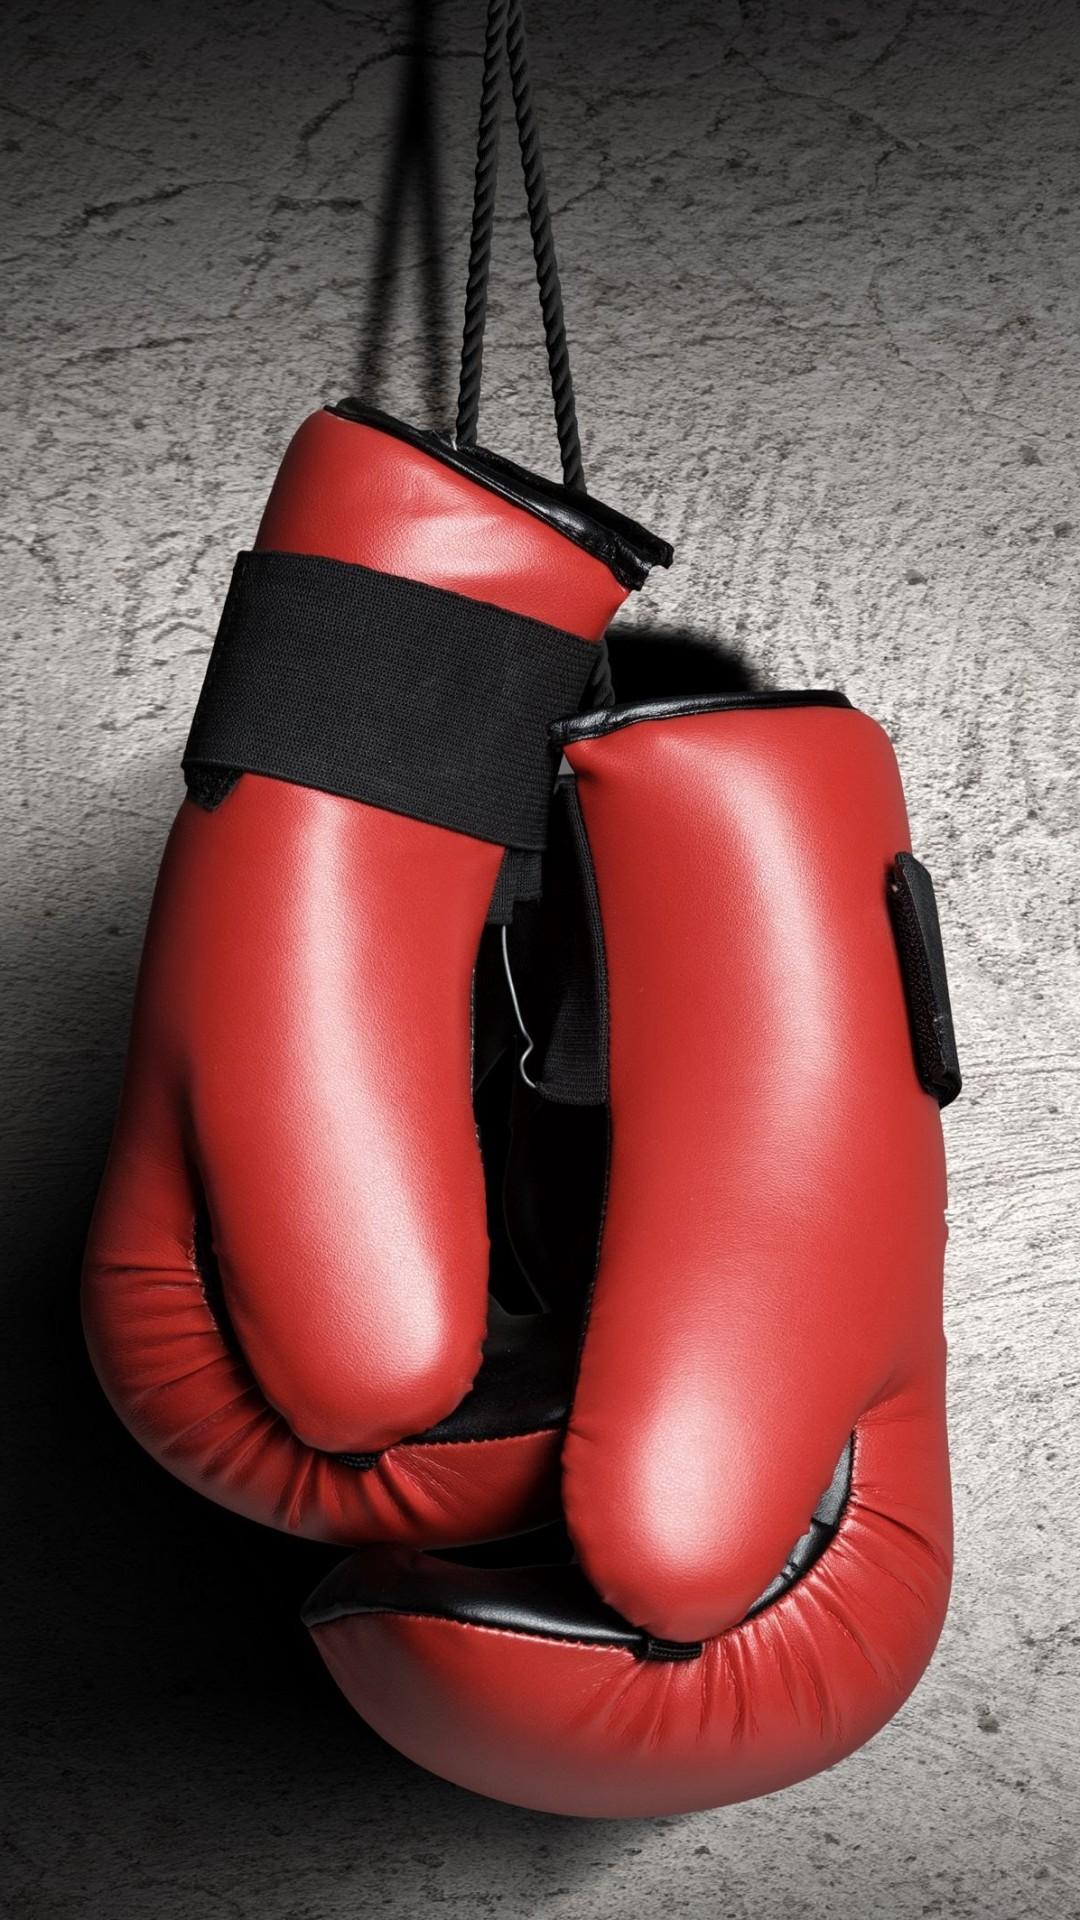 3d Art Nature Wallpaper Wallpaper Boxing Gloves Red Boxing Sport 11209